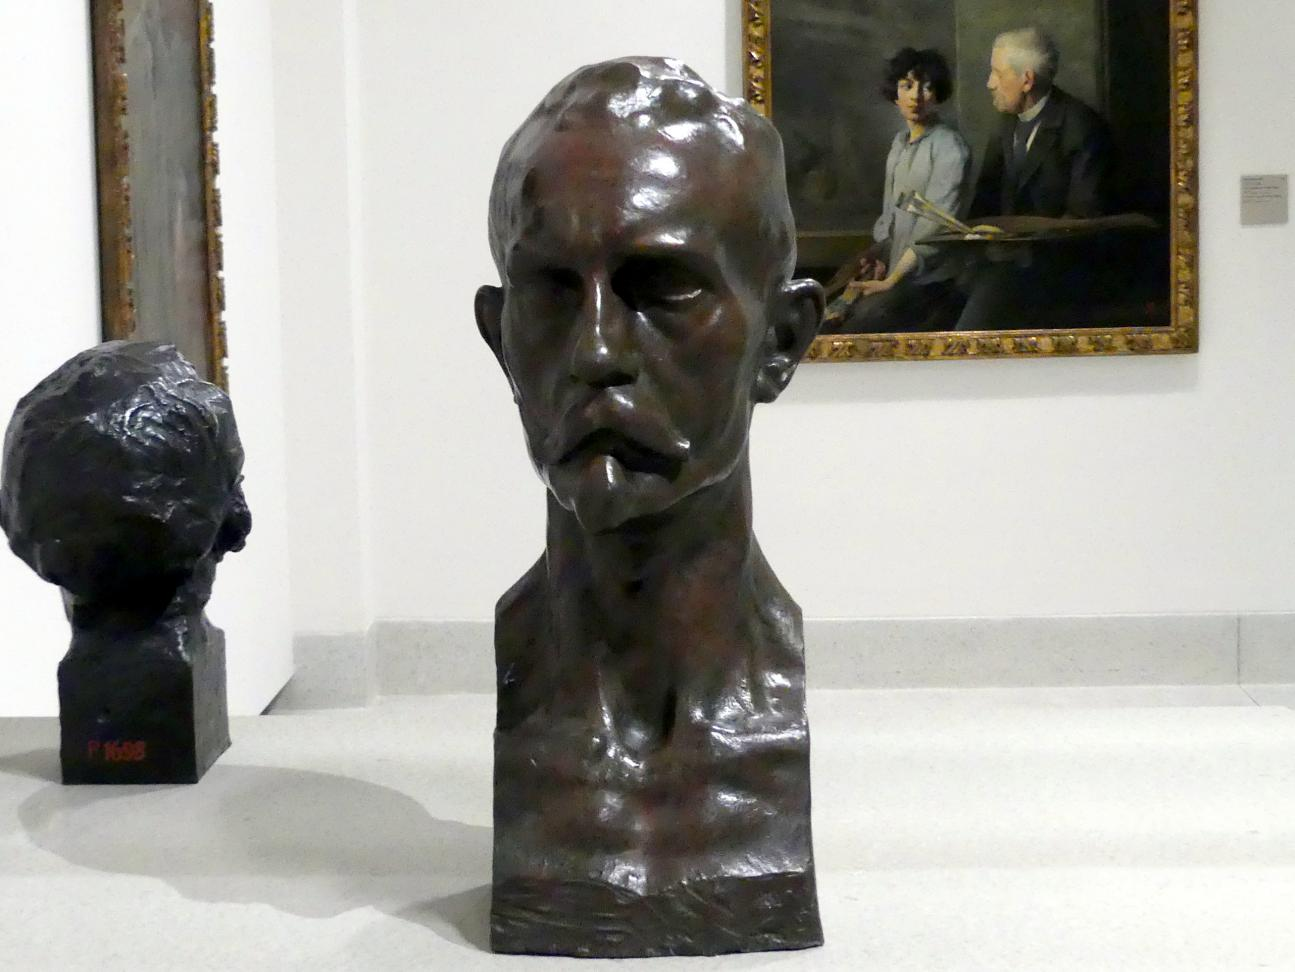 Ivan Meštrović: Büste des Bildhauers Bohumil Kafka, vor 1914